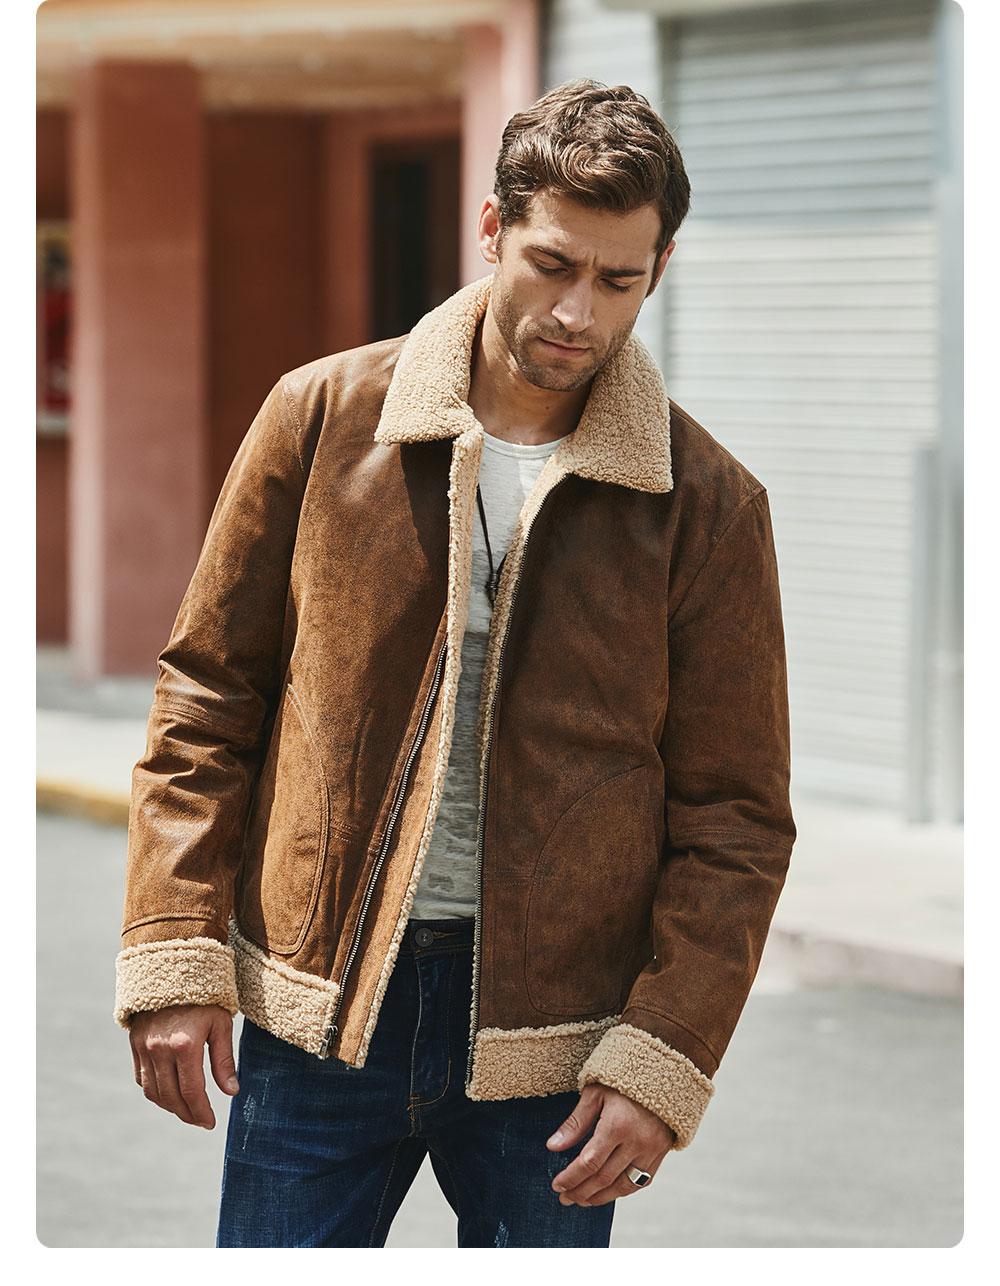 H782bc77aeeb74341b9fb98d010fa8630k New Men's Real Leather Jacket Faux Fur Collar Genuine Leather Jacket